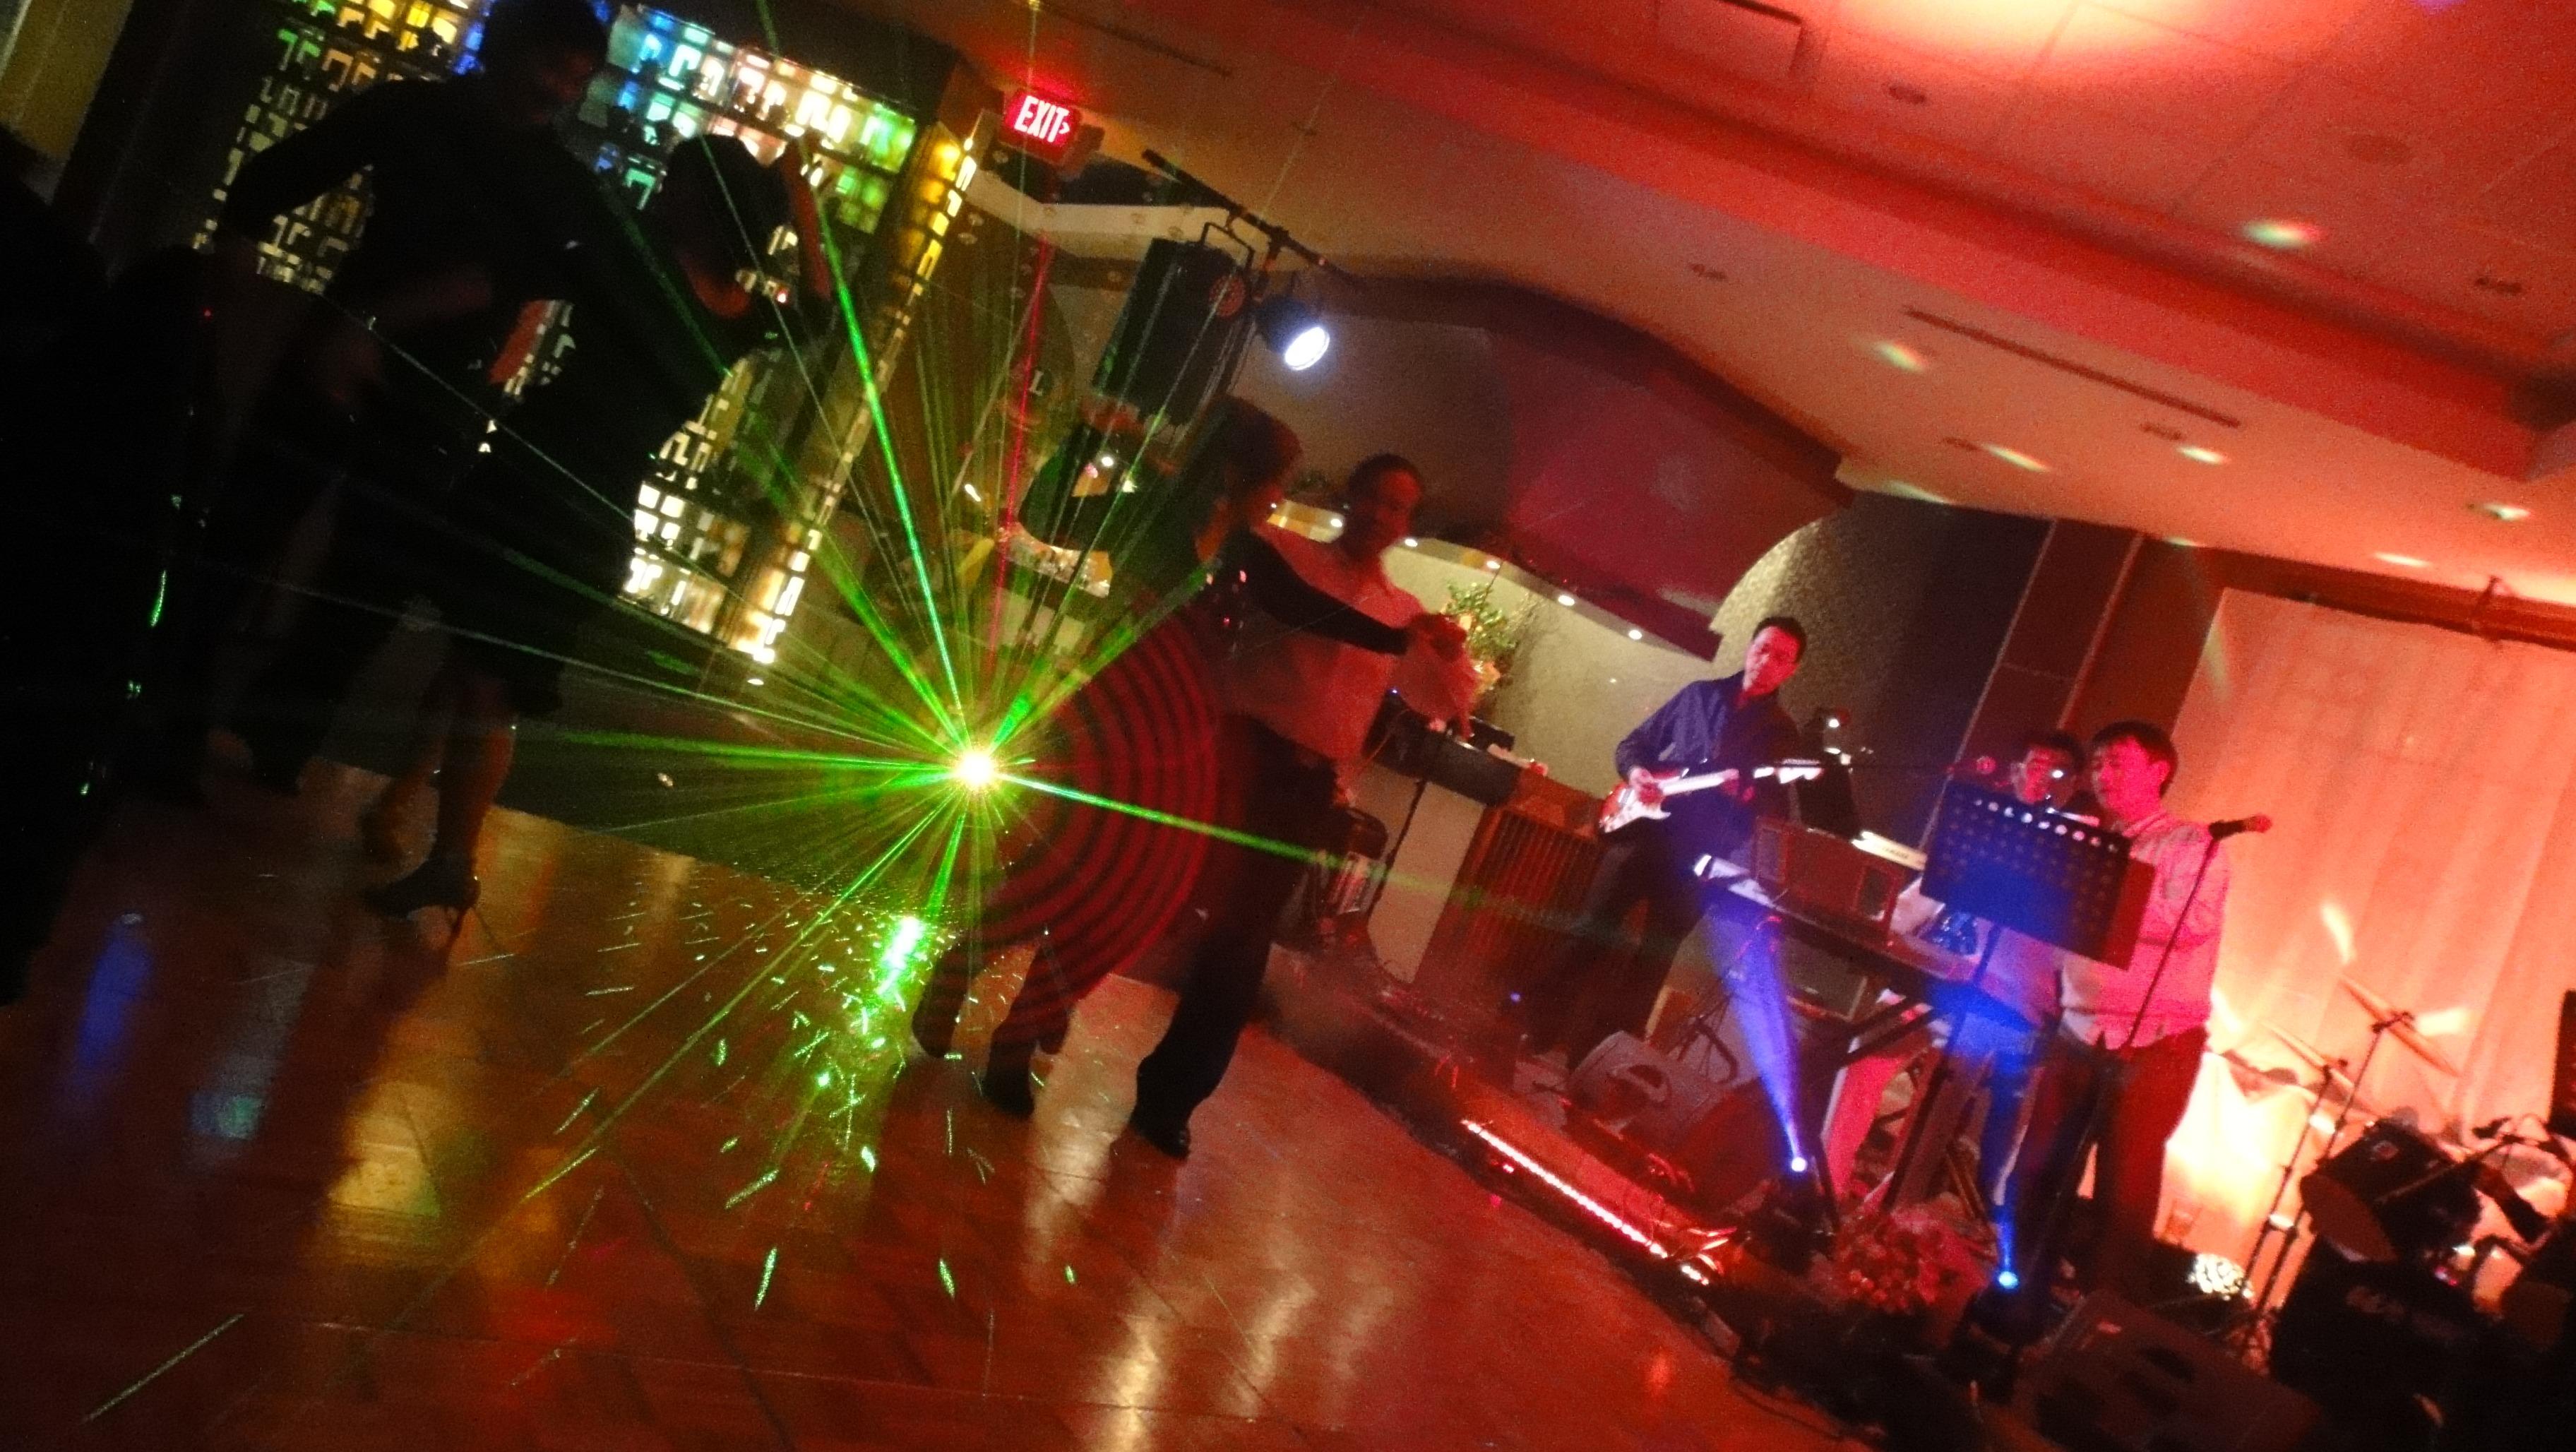 Happy New Year Wallpaper Iphone 6 Free Stock Photo Of Dance Dancing Disco